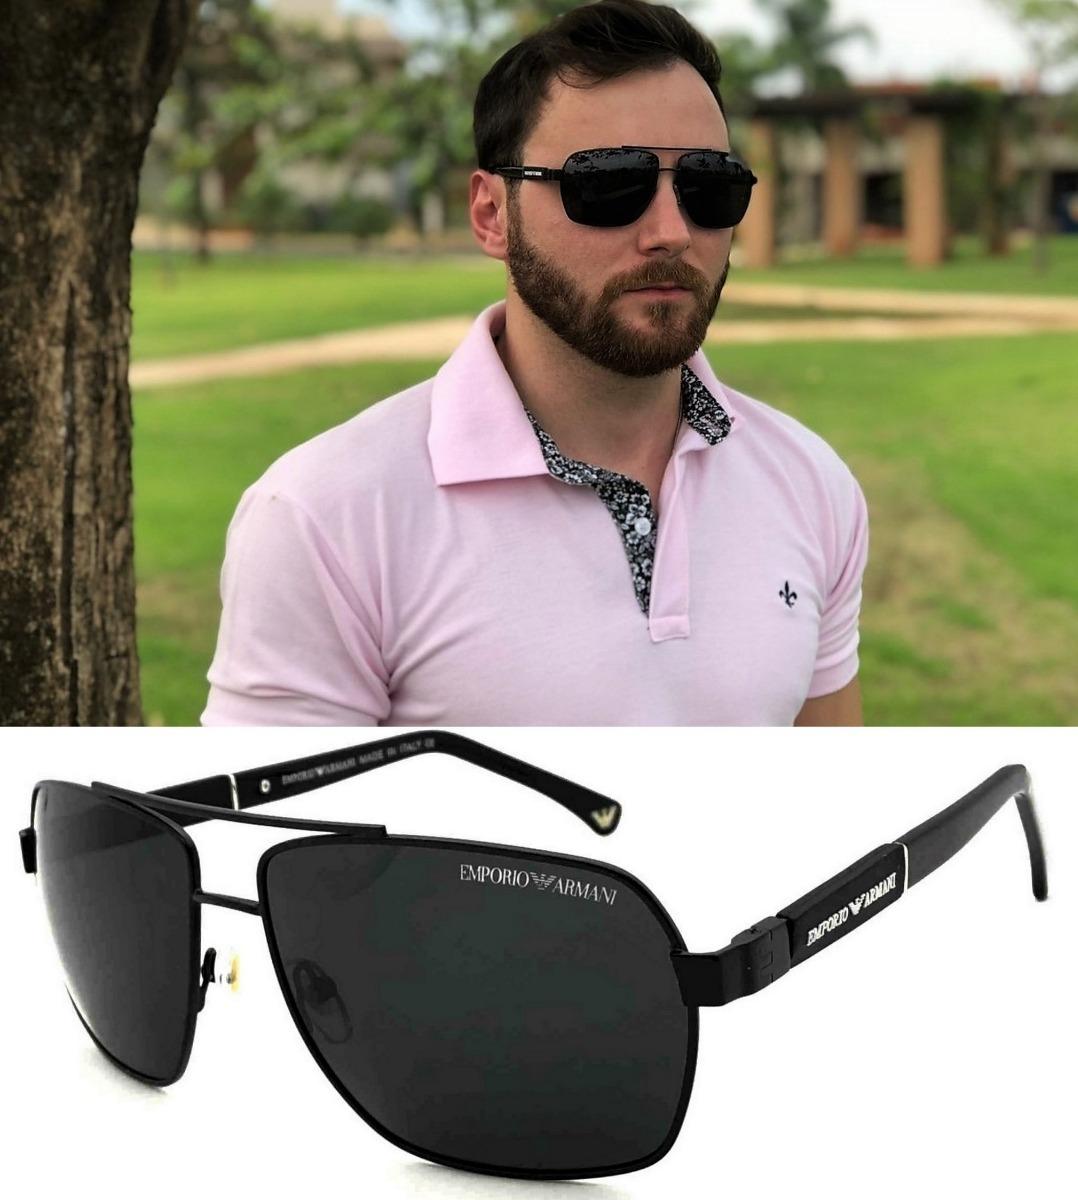 Oculos De Sol Masculino Premium Ea3071 Black Uv400 - R  98,00 em ... 6acac76126